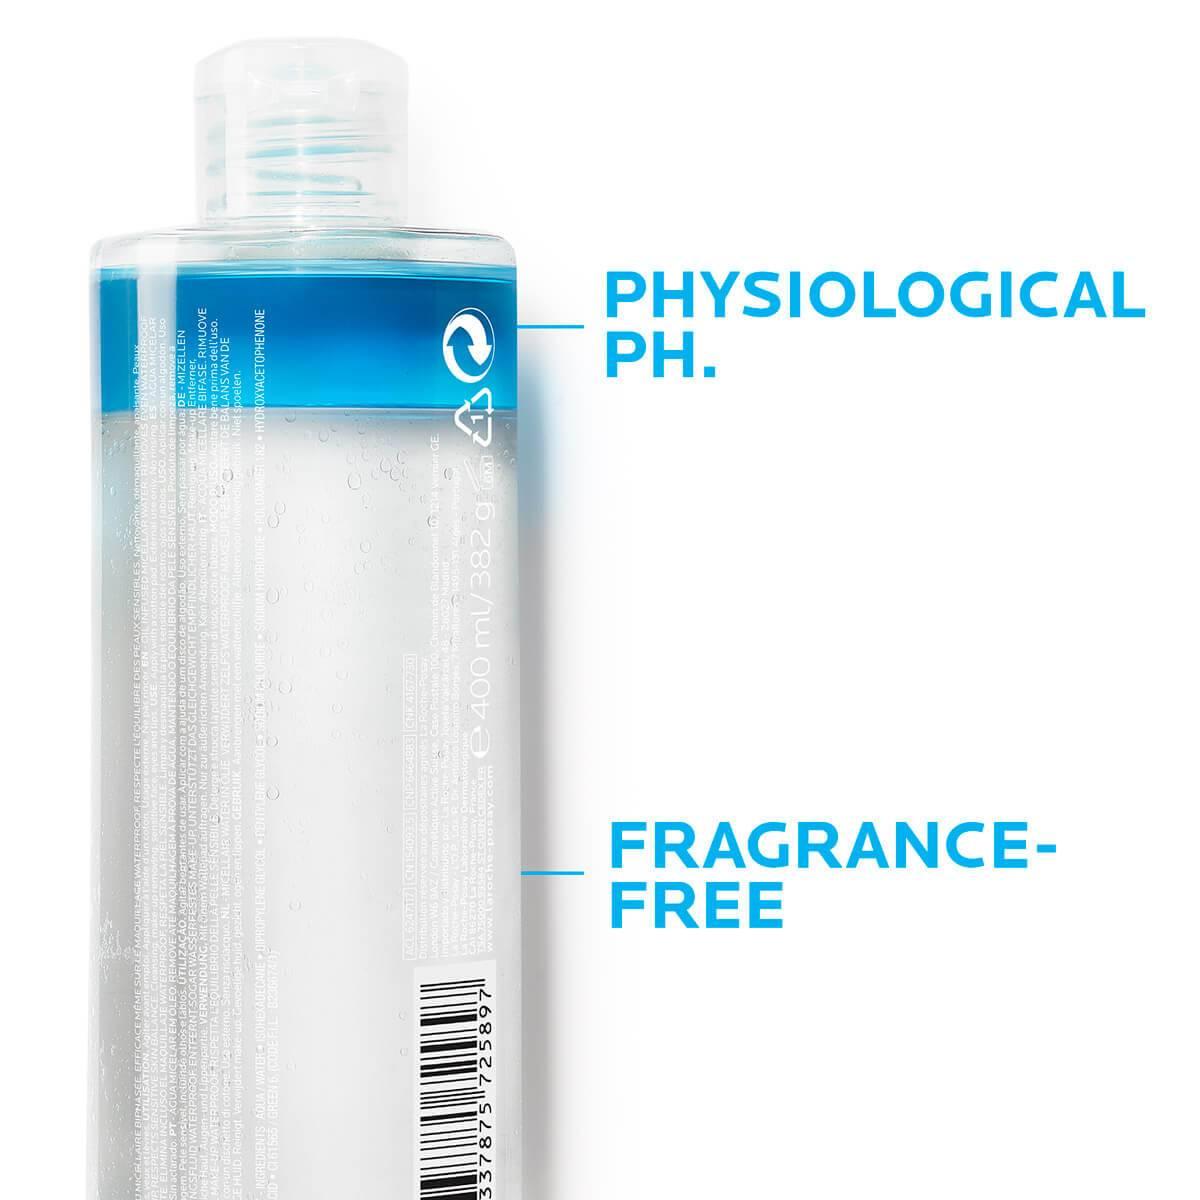 LaRochePosay-Produkt-Oblicej-Fyziologicky-Olej-Obohaceny-Micelarni-Vodou-Ultra-400ml-3337875725897-Detail-BLS